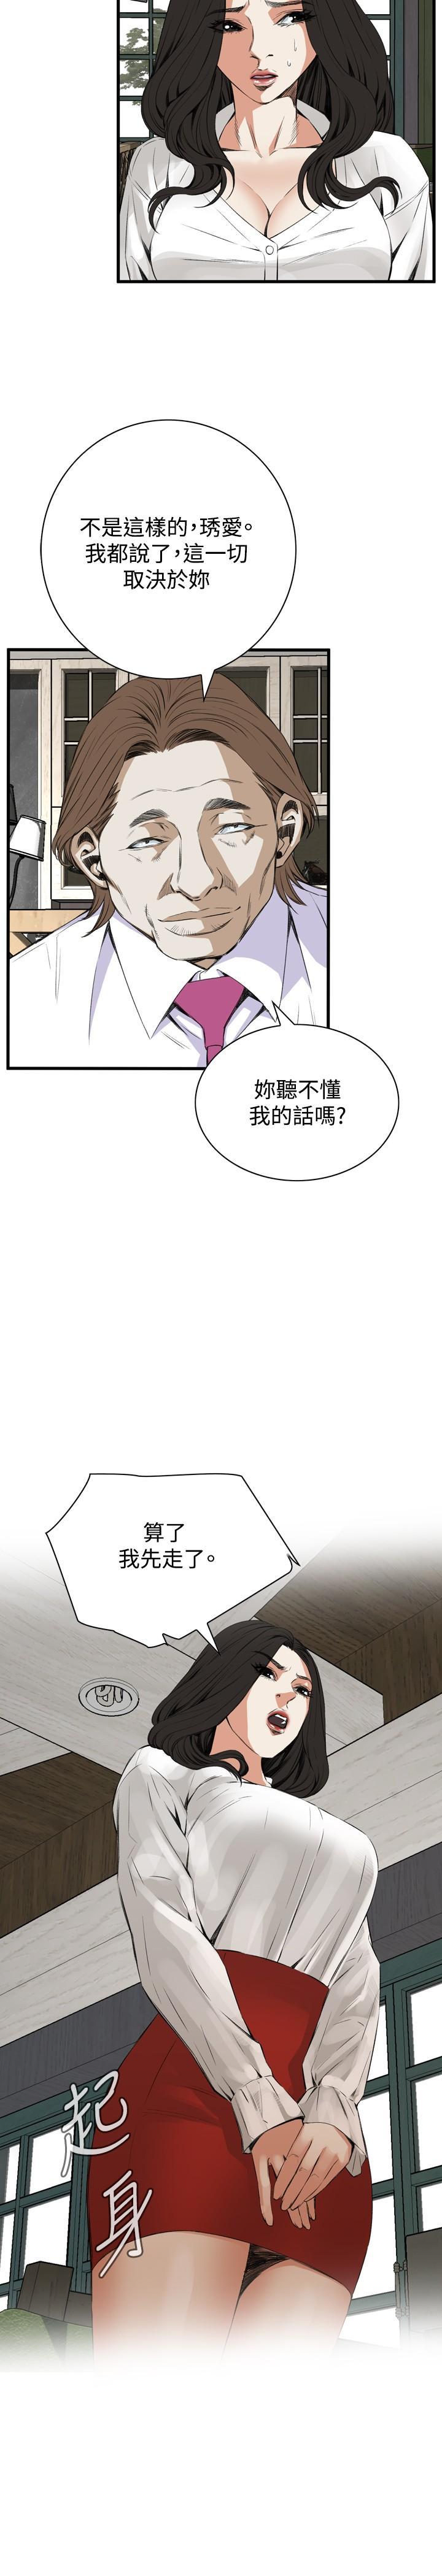 Take a Peek 偷窥 Ch.39~55 [Chinese]中文 277